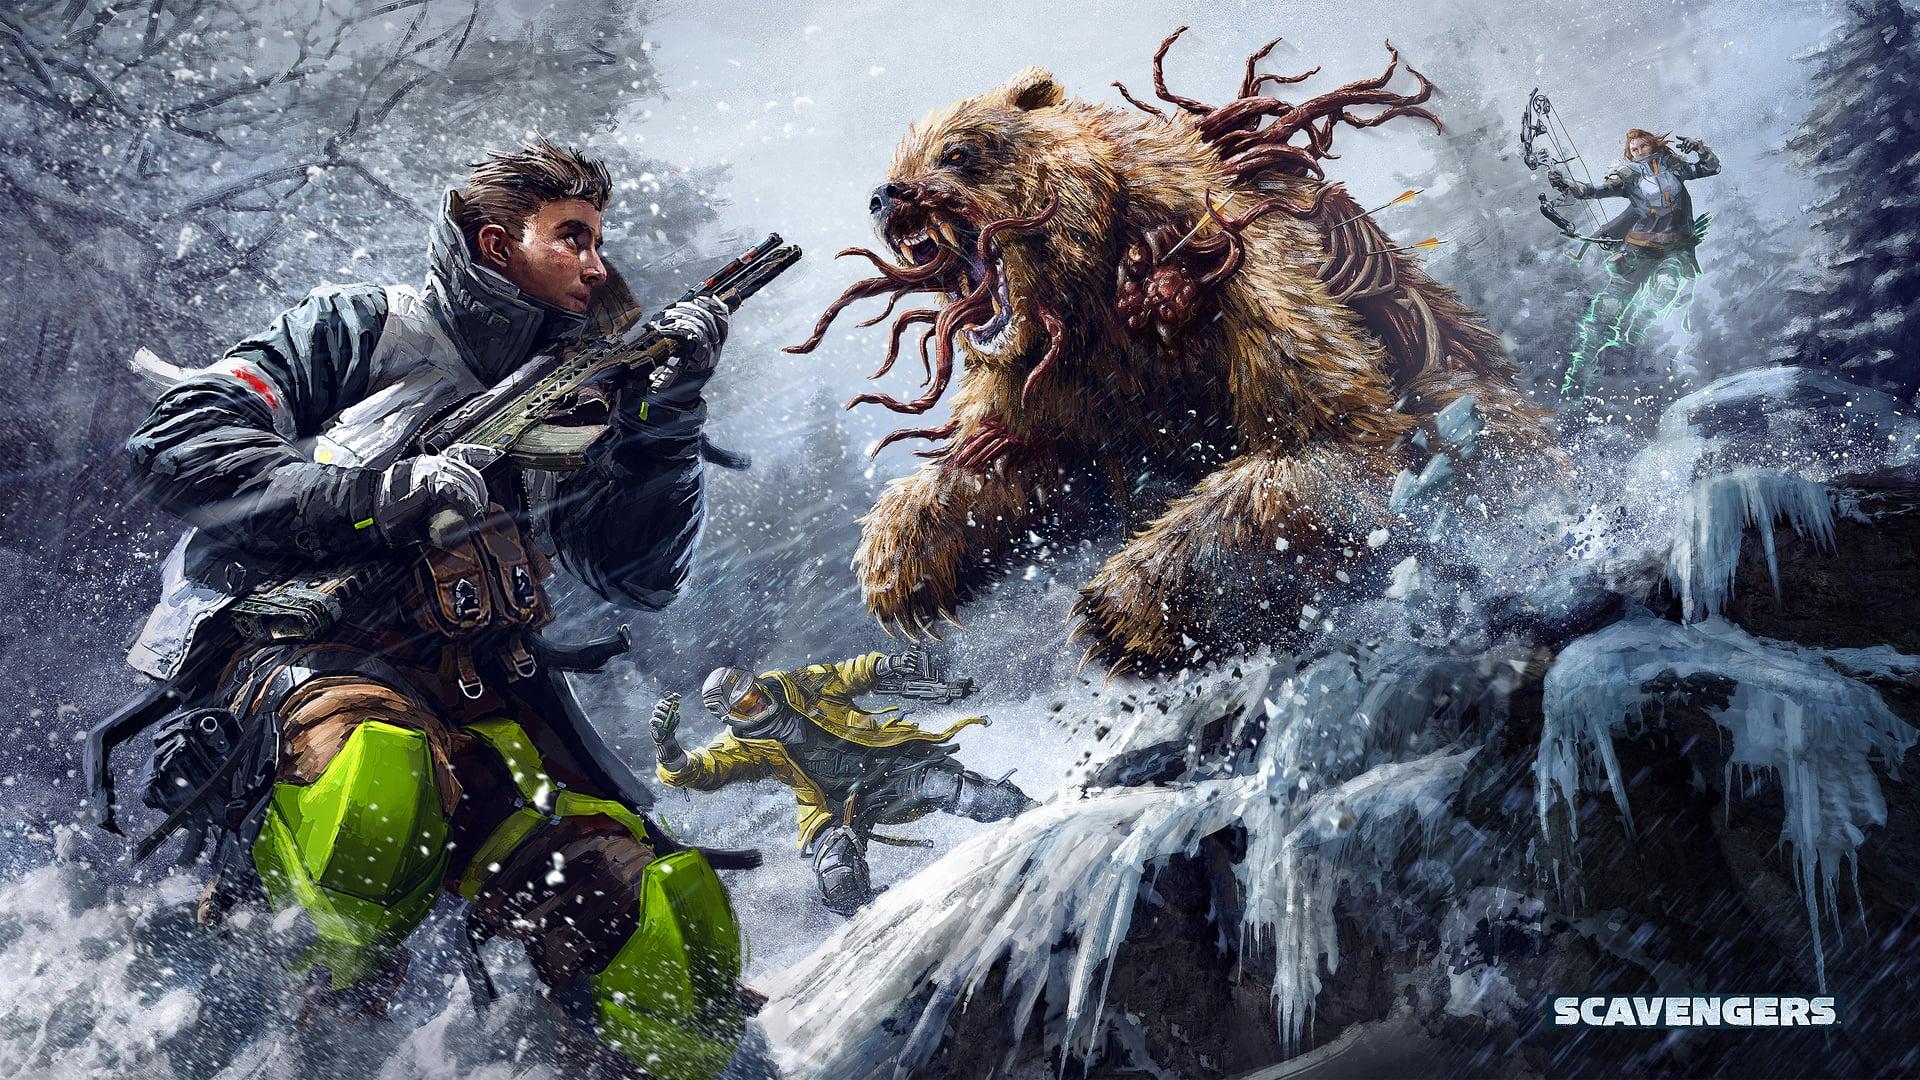 Scavengers Wallpaper Background Mutant Bear